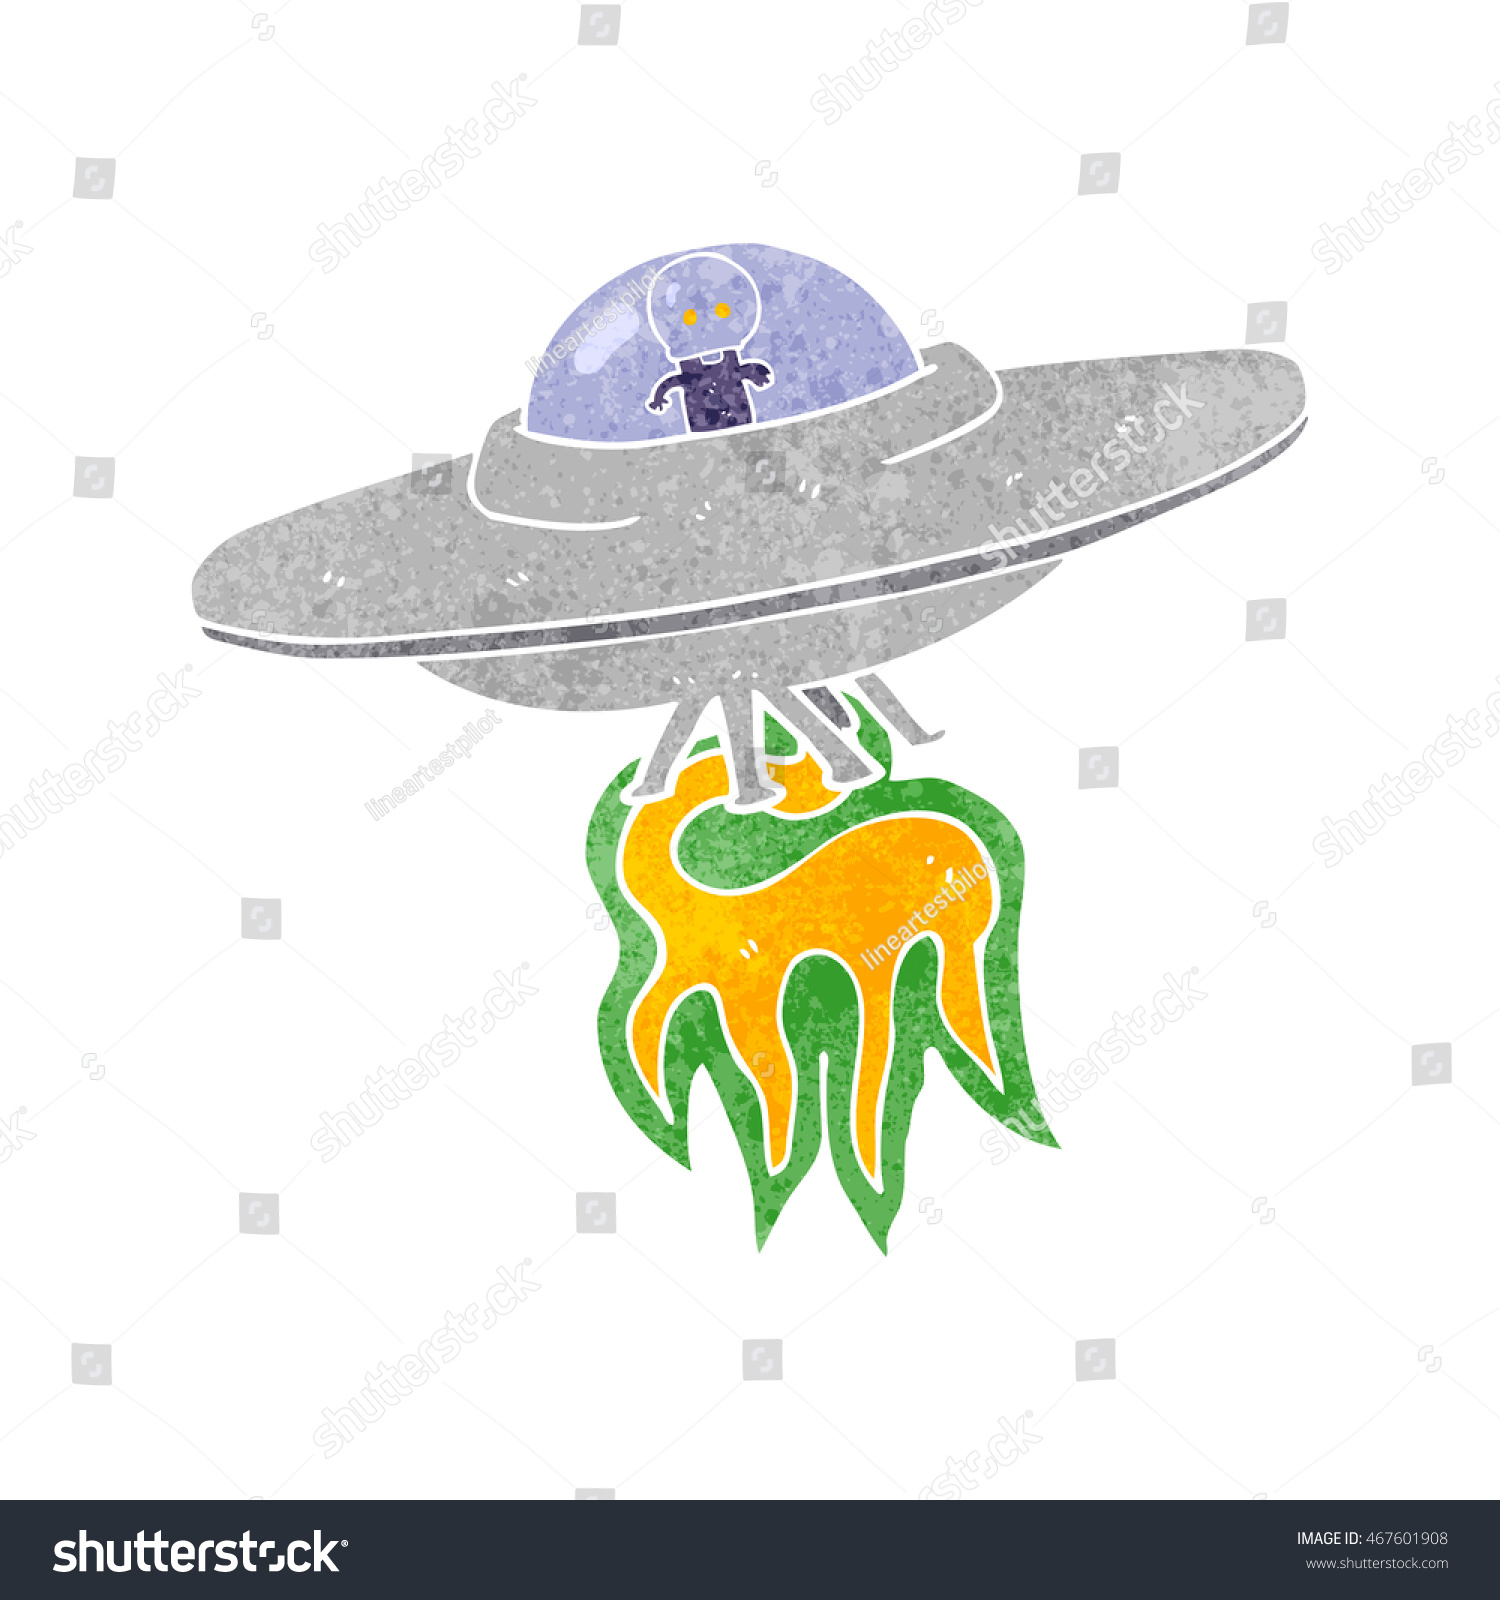 31f1385c2918d0 Freehand retro cartoon alien flying saucer stock illustration jpg 1500x1600 Alien  sombrero